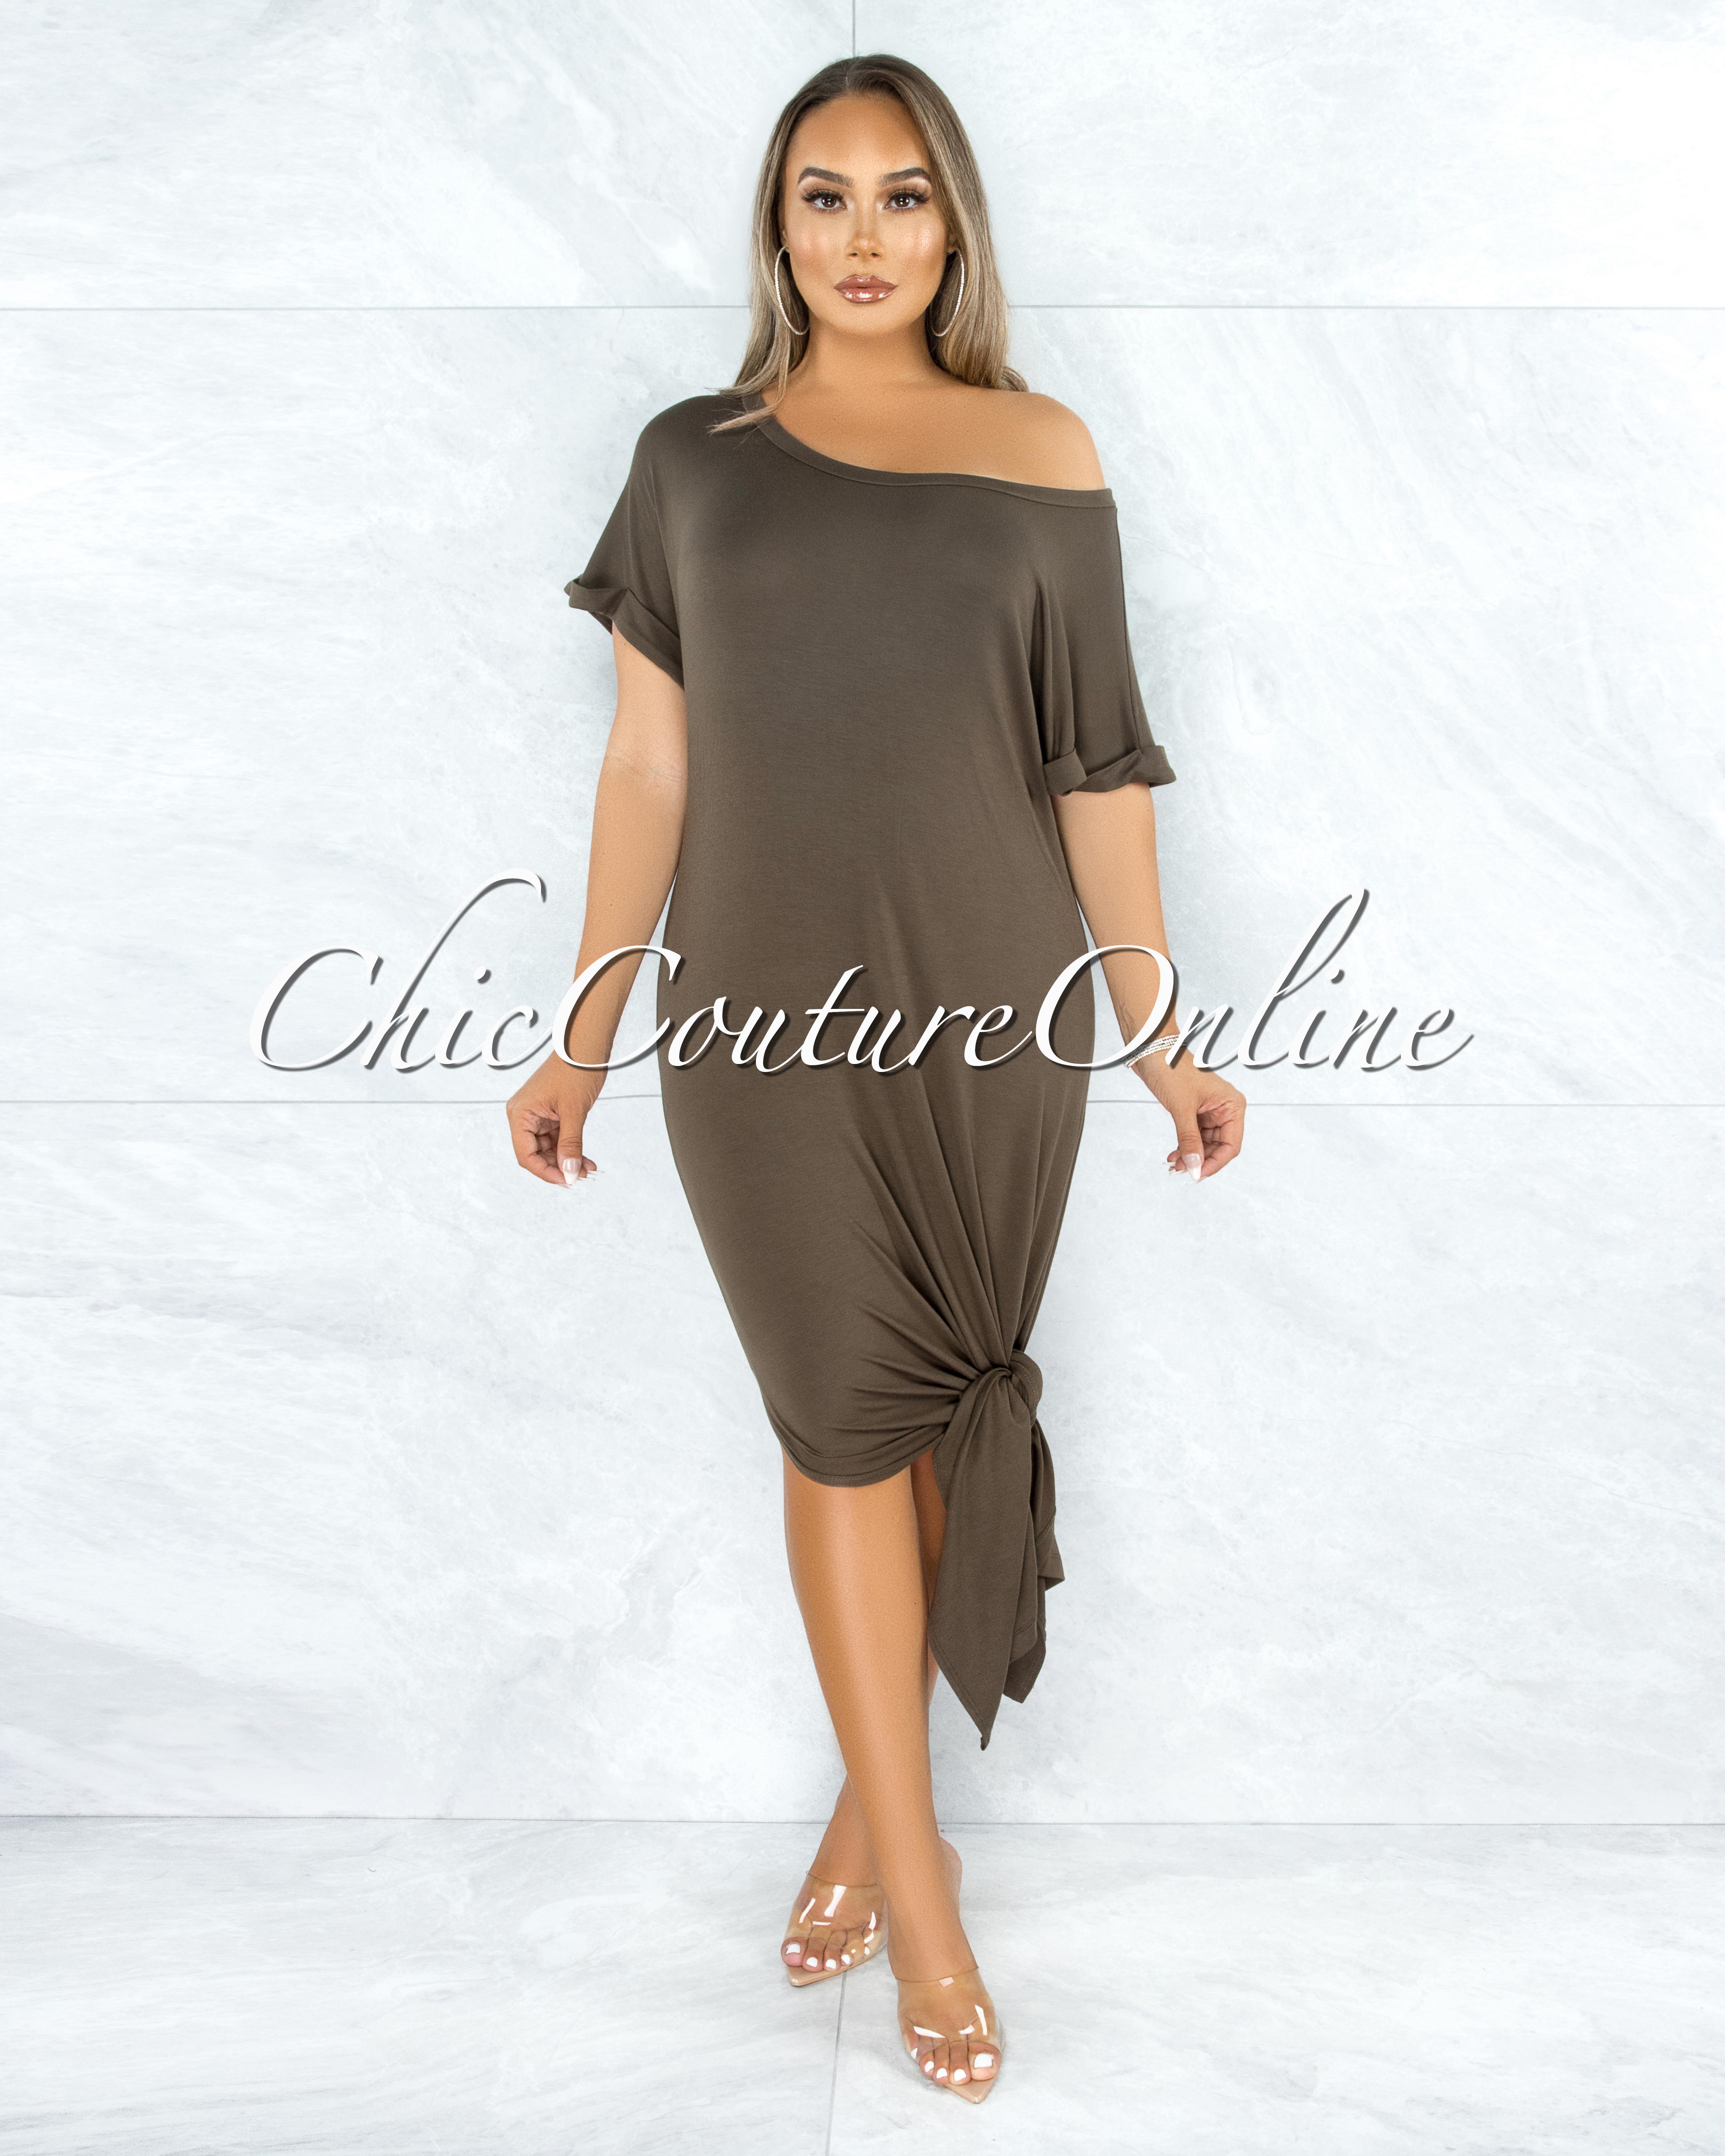 Corday Olive Green Side Slits Shirt Dress